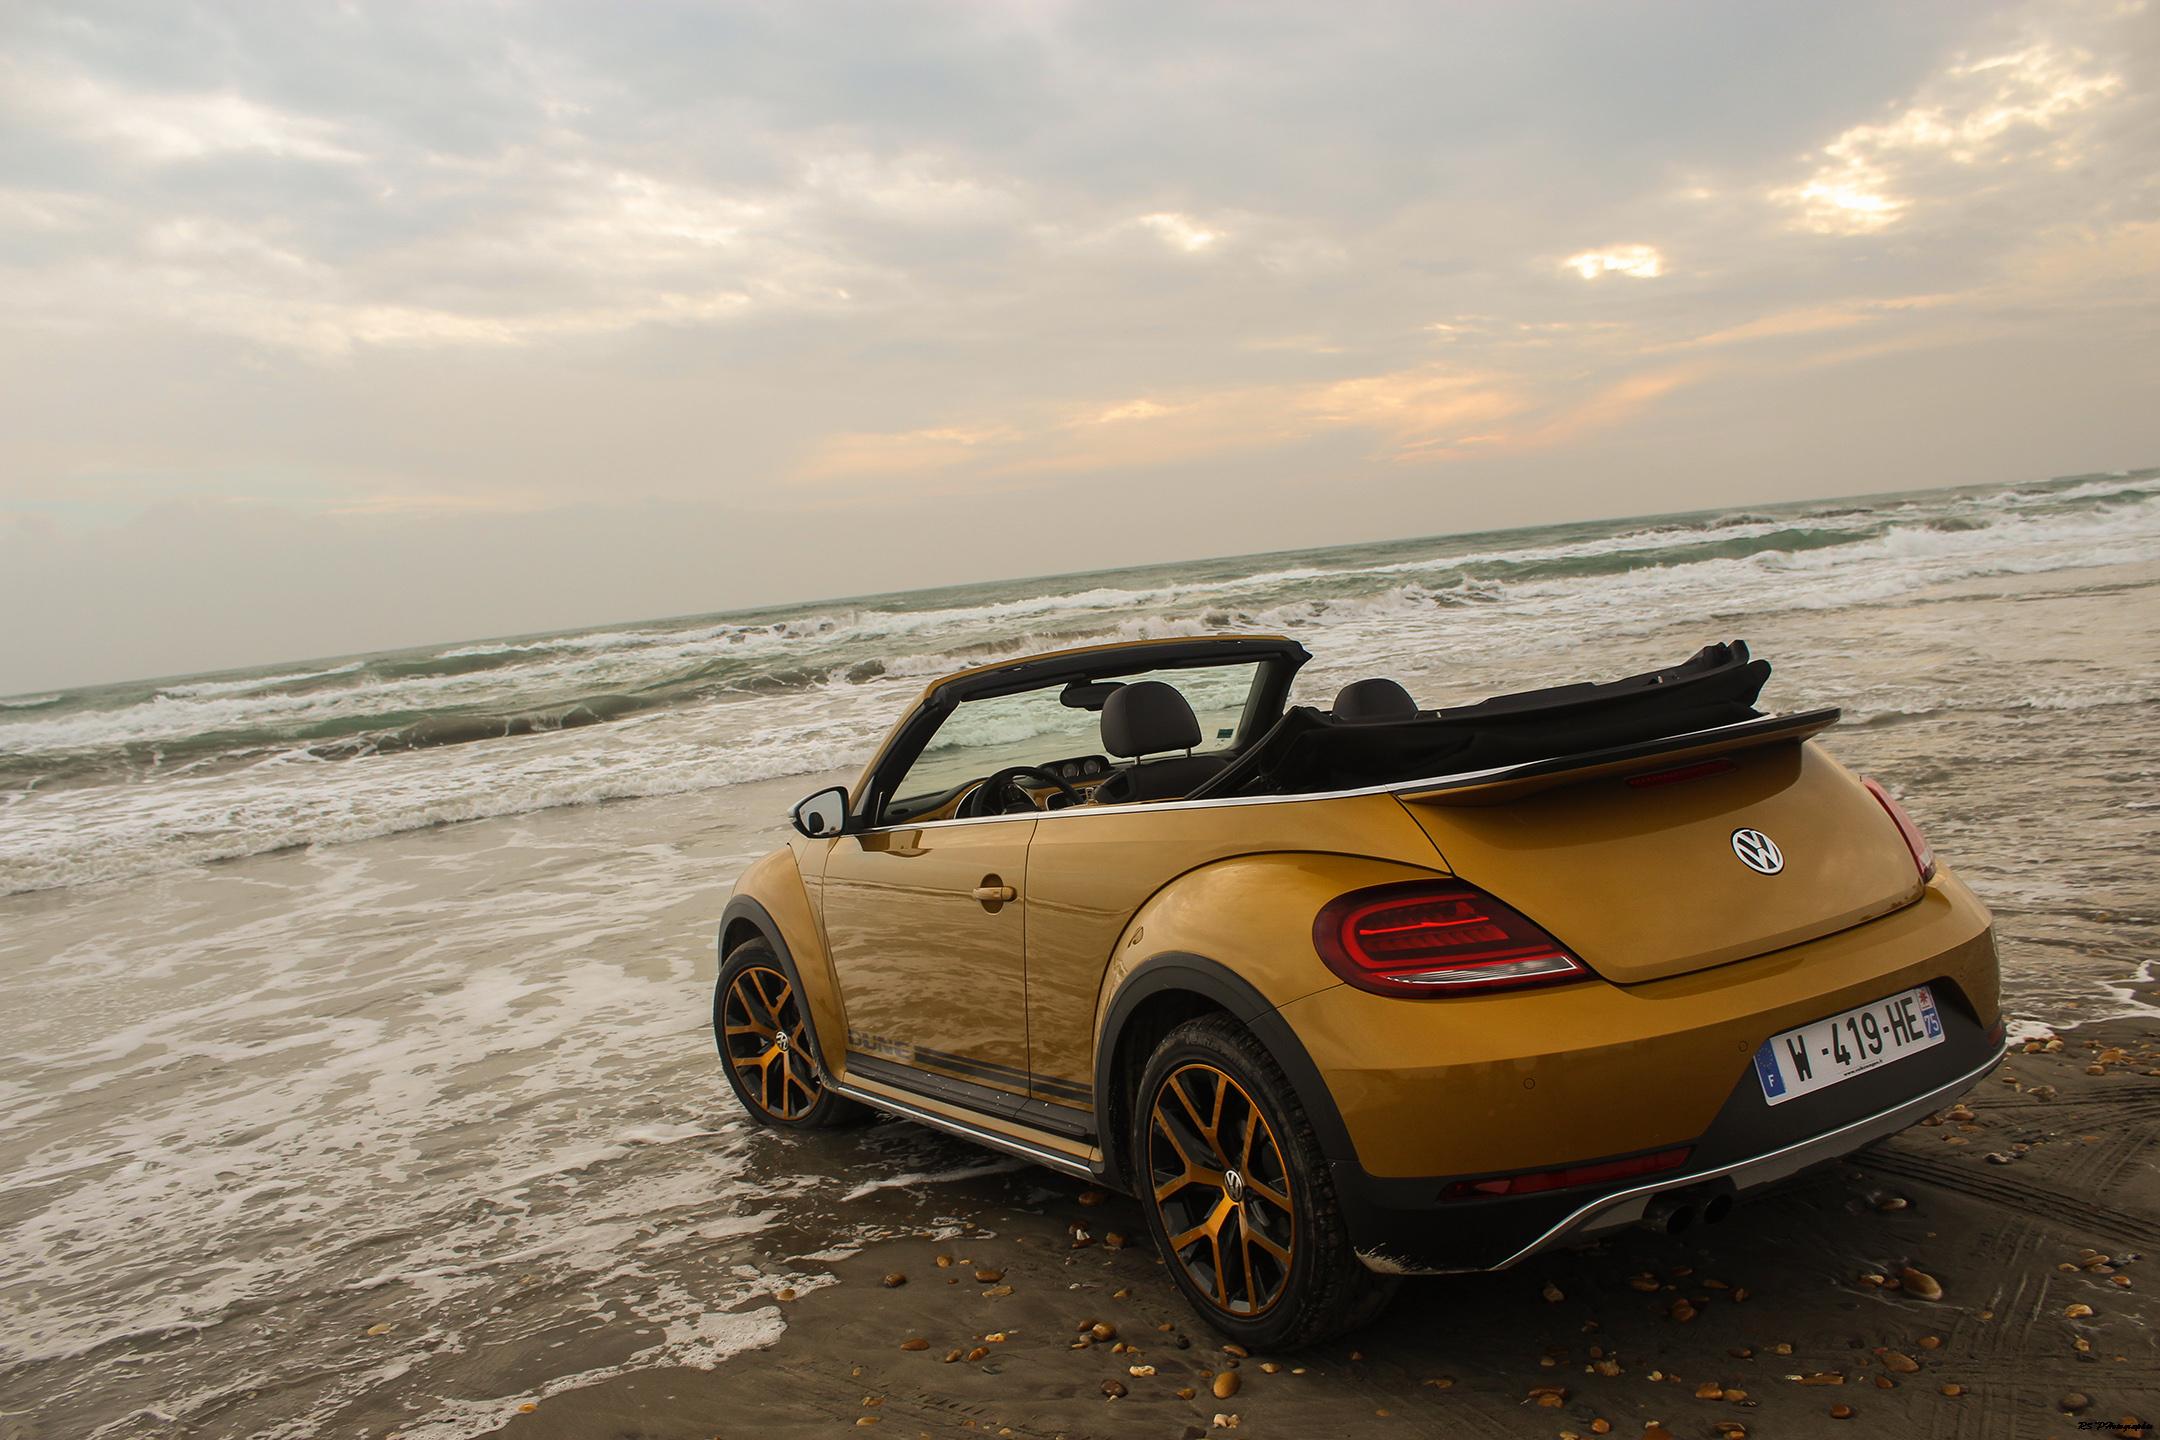 vwcox48-volkswagen-coccinelle-dune-cabriolet-arriere-rear-arnaud-demasier-rsphotographie